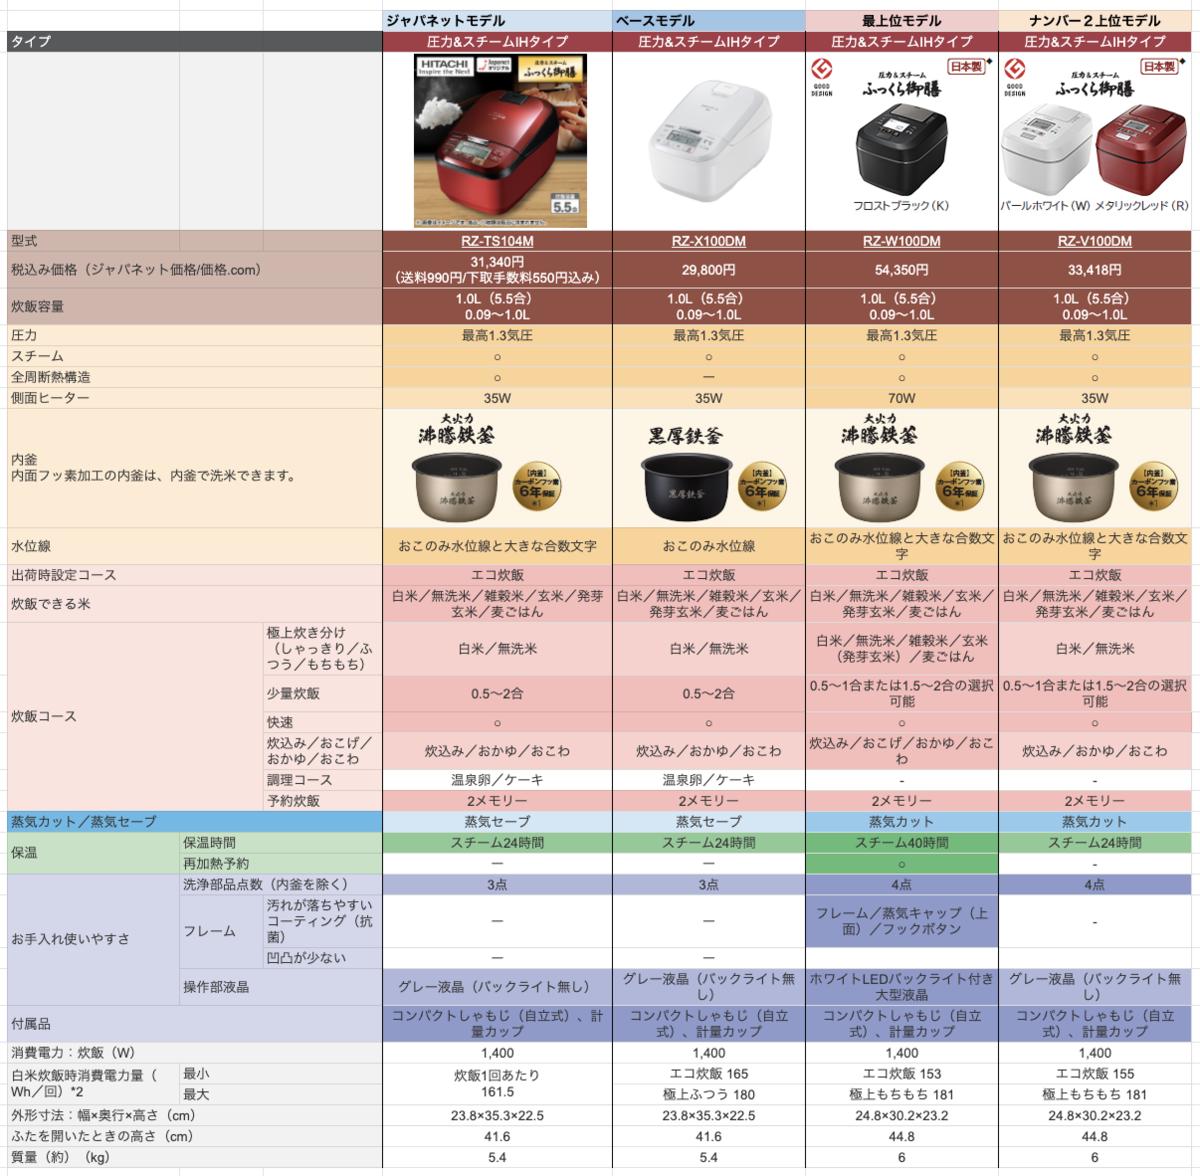 f:id:hardshopper:20201110053436p:plain